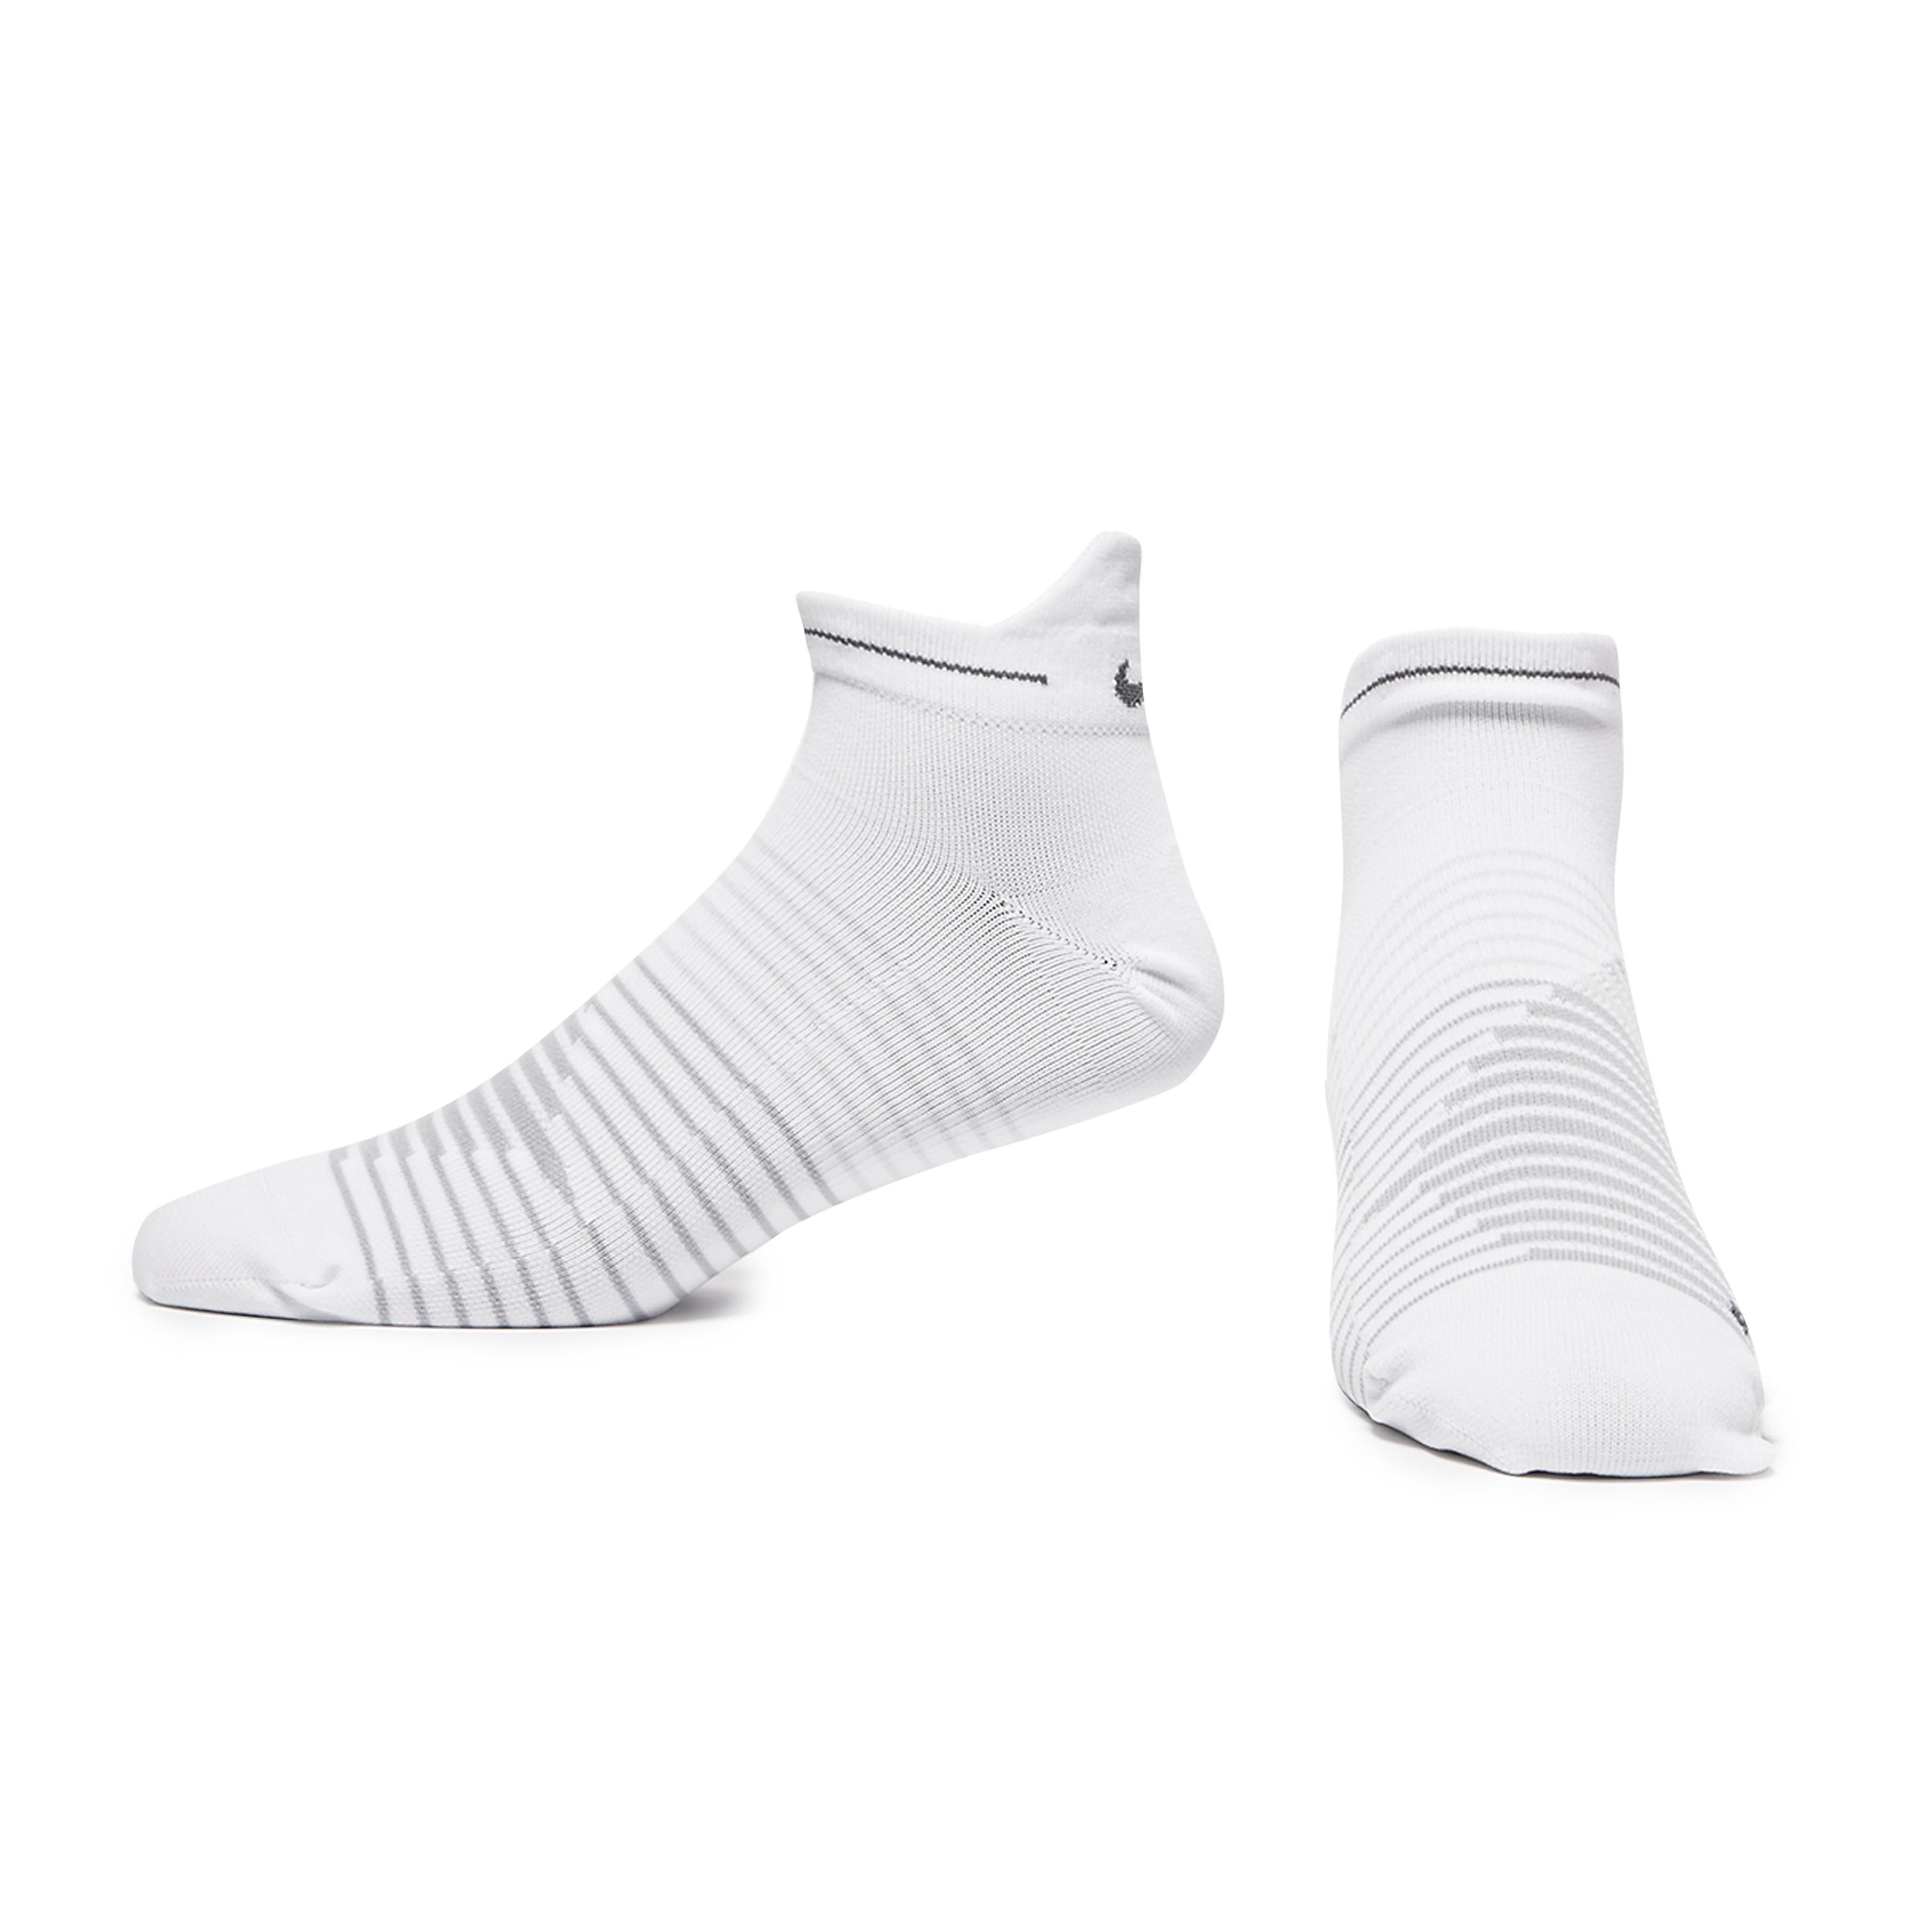 Nike Dri-FIT lightweight No-Show Running Socks